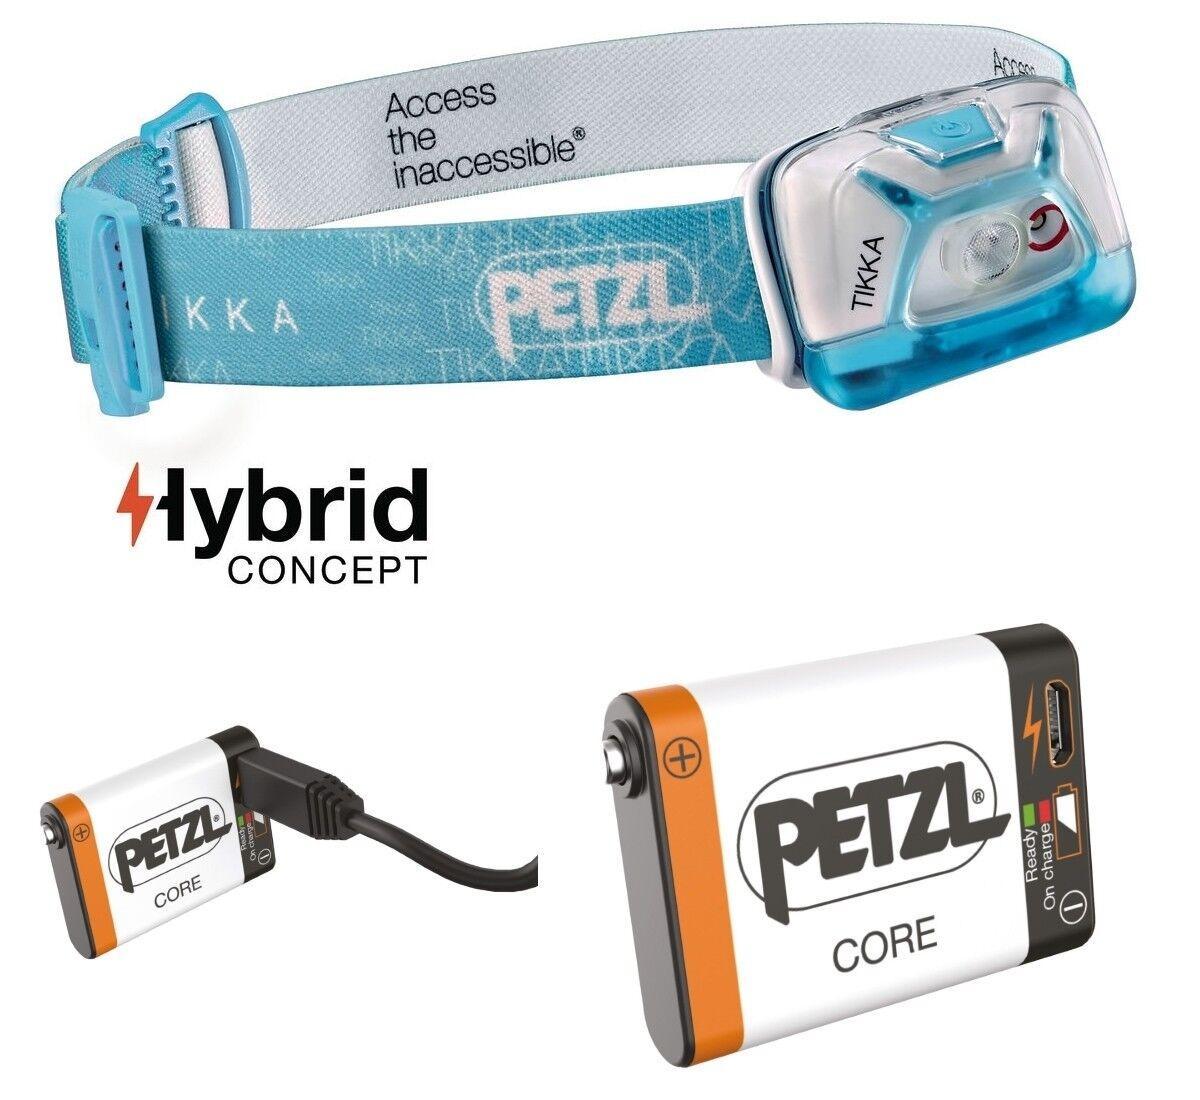 Petzl TIKKA Blau inkl. CORE Ersatzakku für HYBRID-Lampen - max. max. max. 200 Lumen ed8371